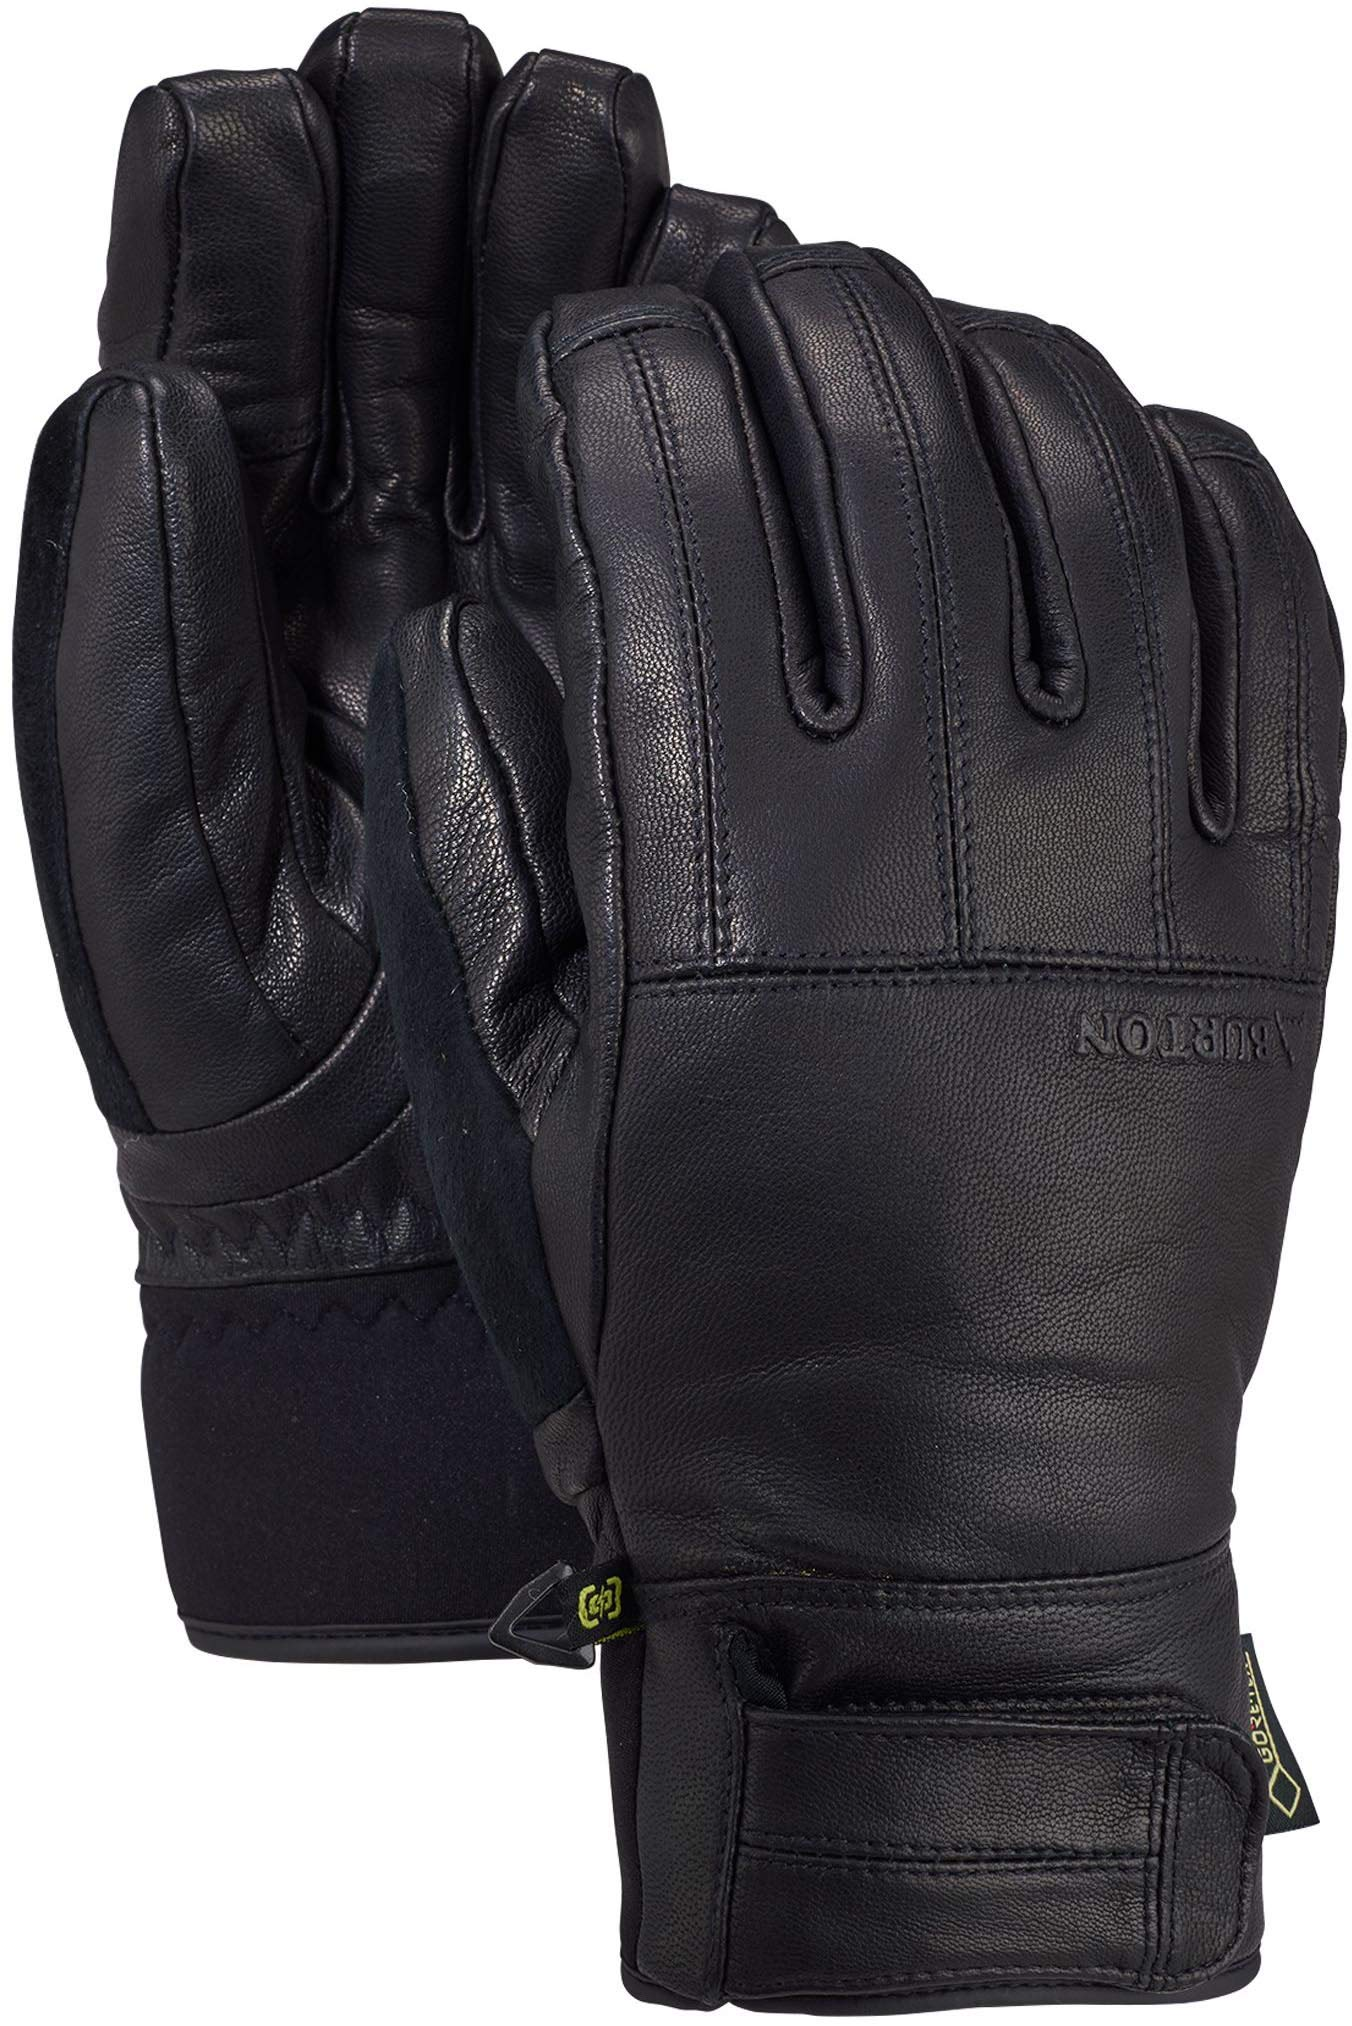 Burton Men's Gore-Tex Gondy Leather Glove, True Black W20, Large